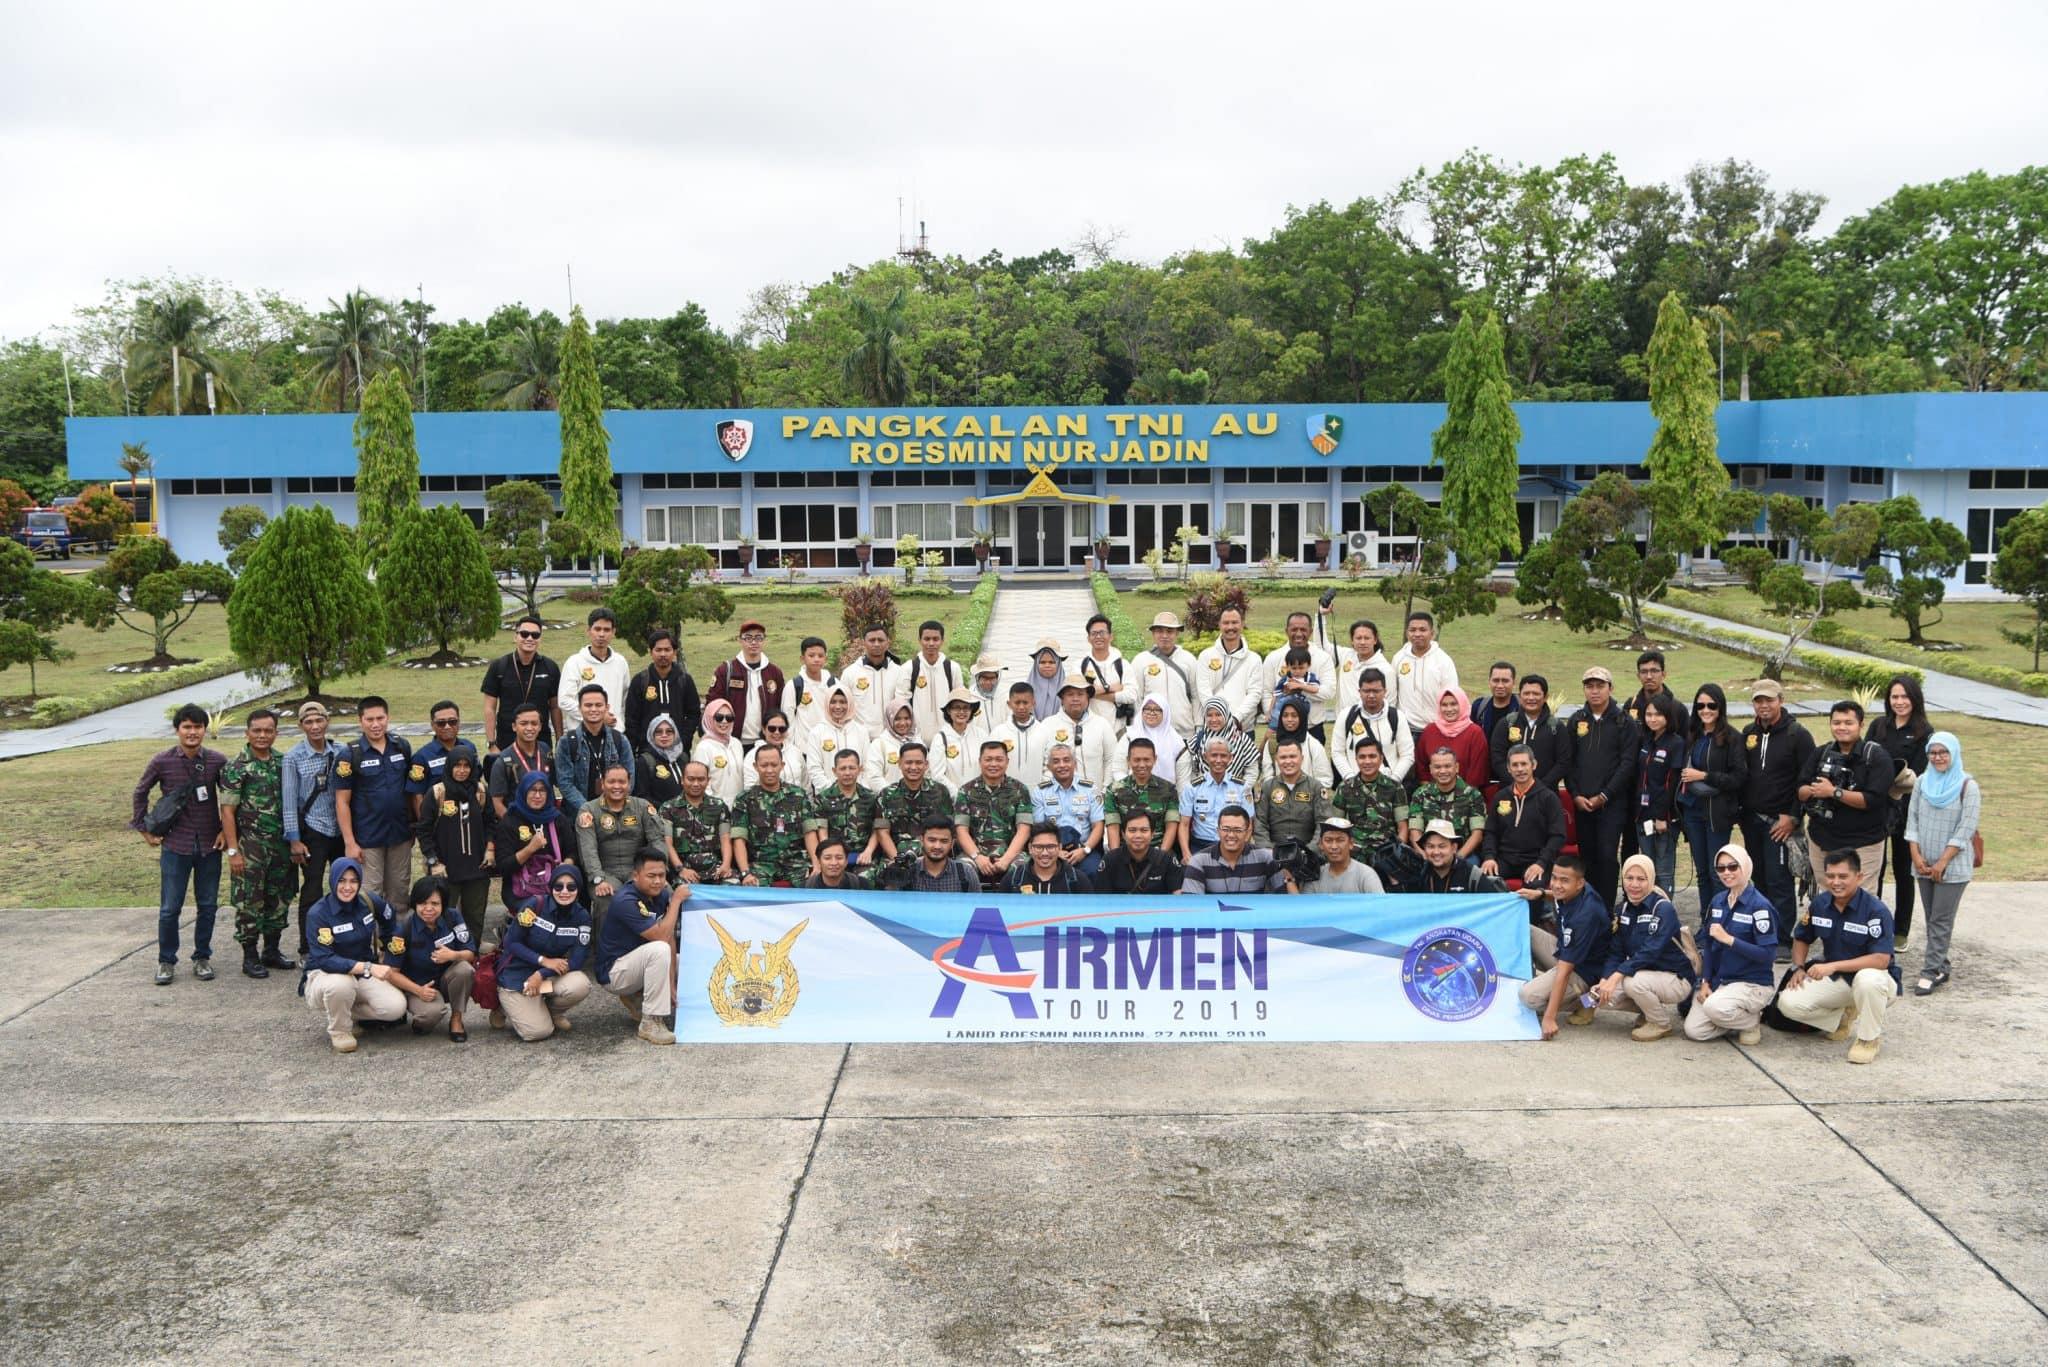 Airmen Tour 2019 Kunjungi Lanud Terbesar Di Sumatera